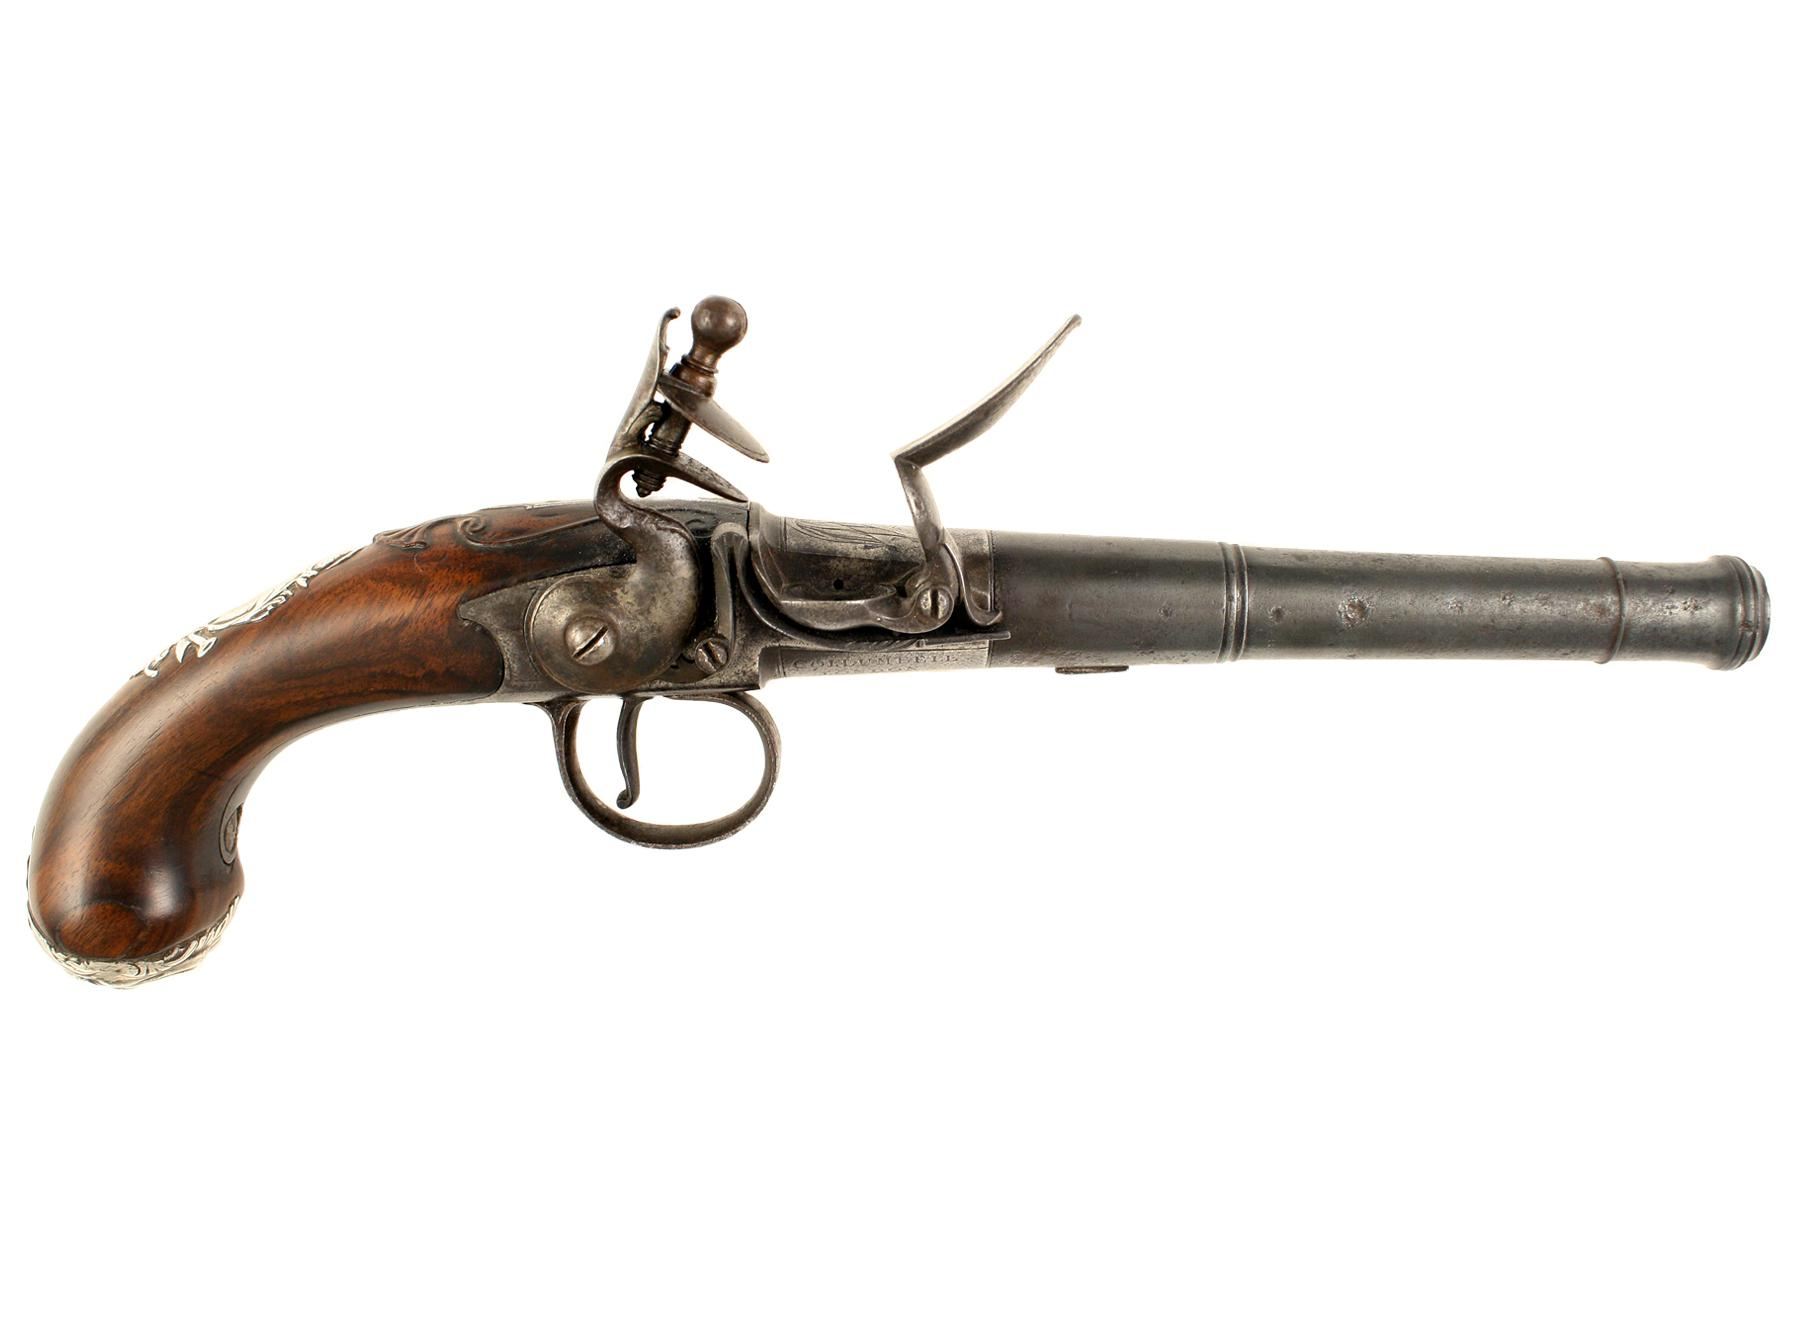 A Queen Anne Pistol